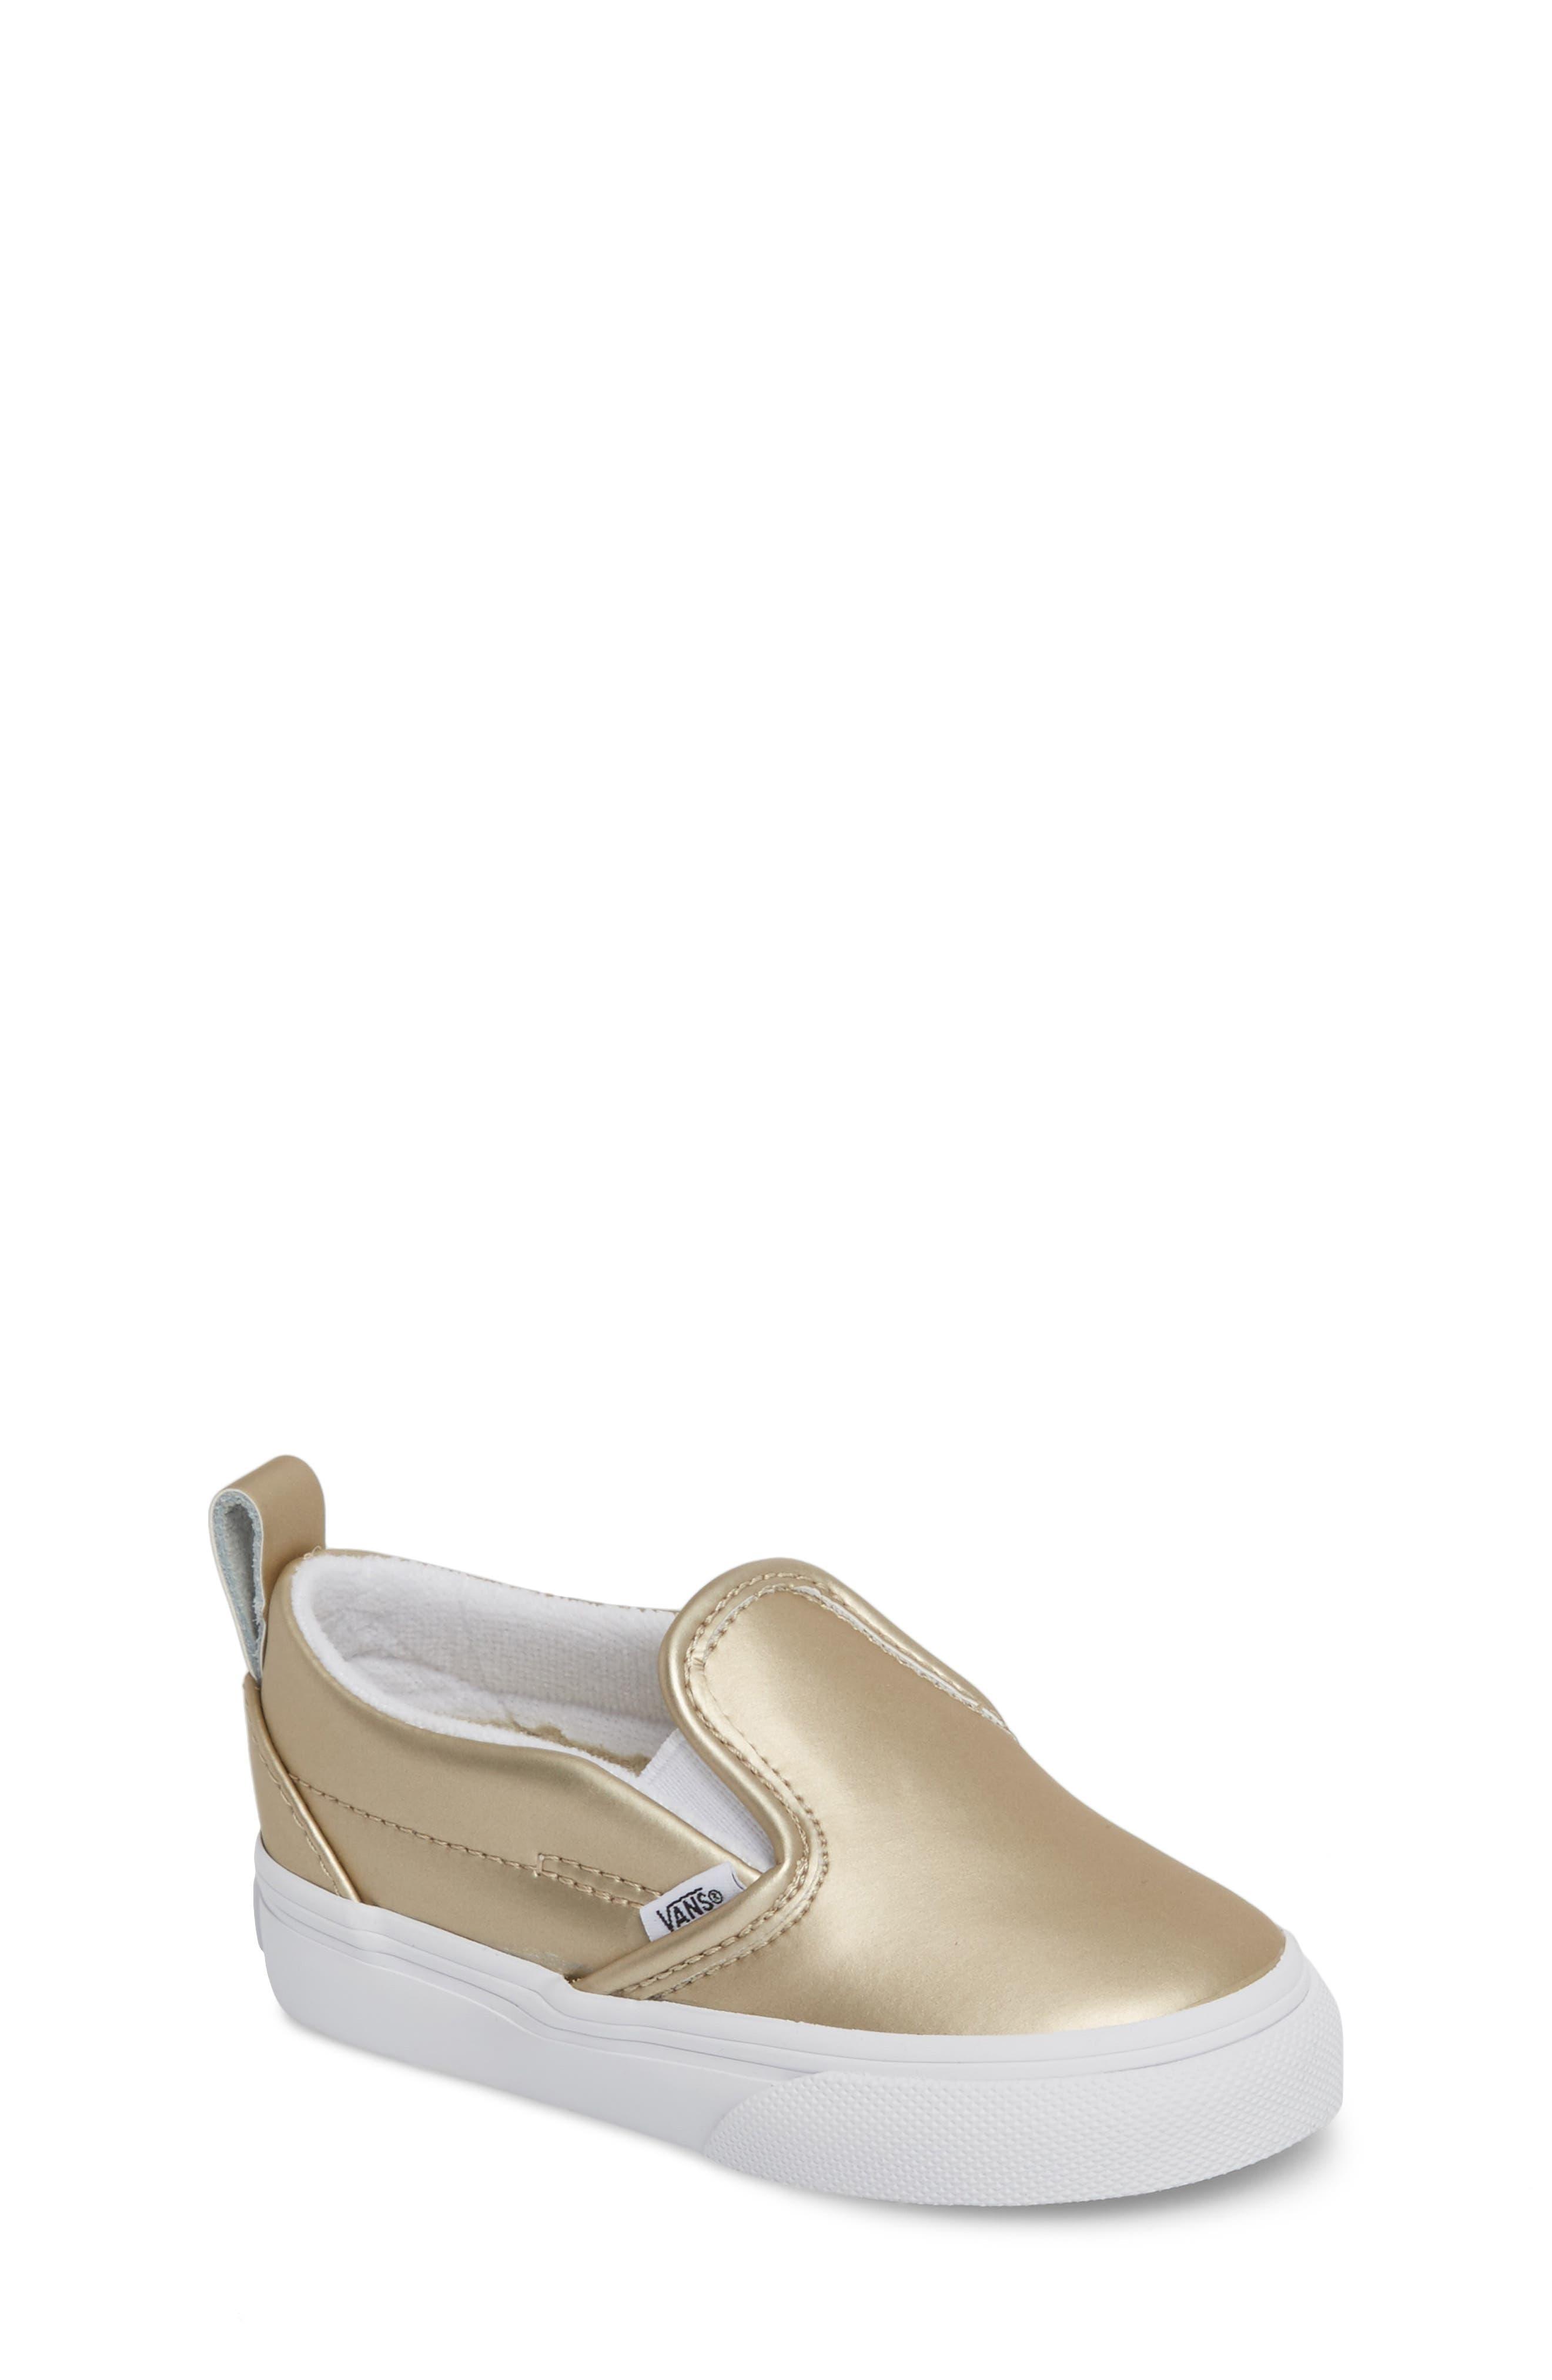 Classic Slip-On V Sneaker,                             Main thumbnail 1, color,                             Muted Metallic Gold/ White